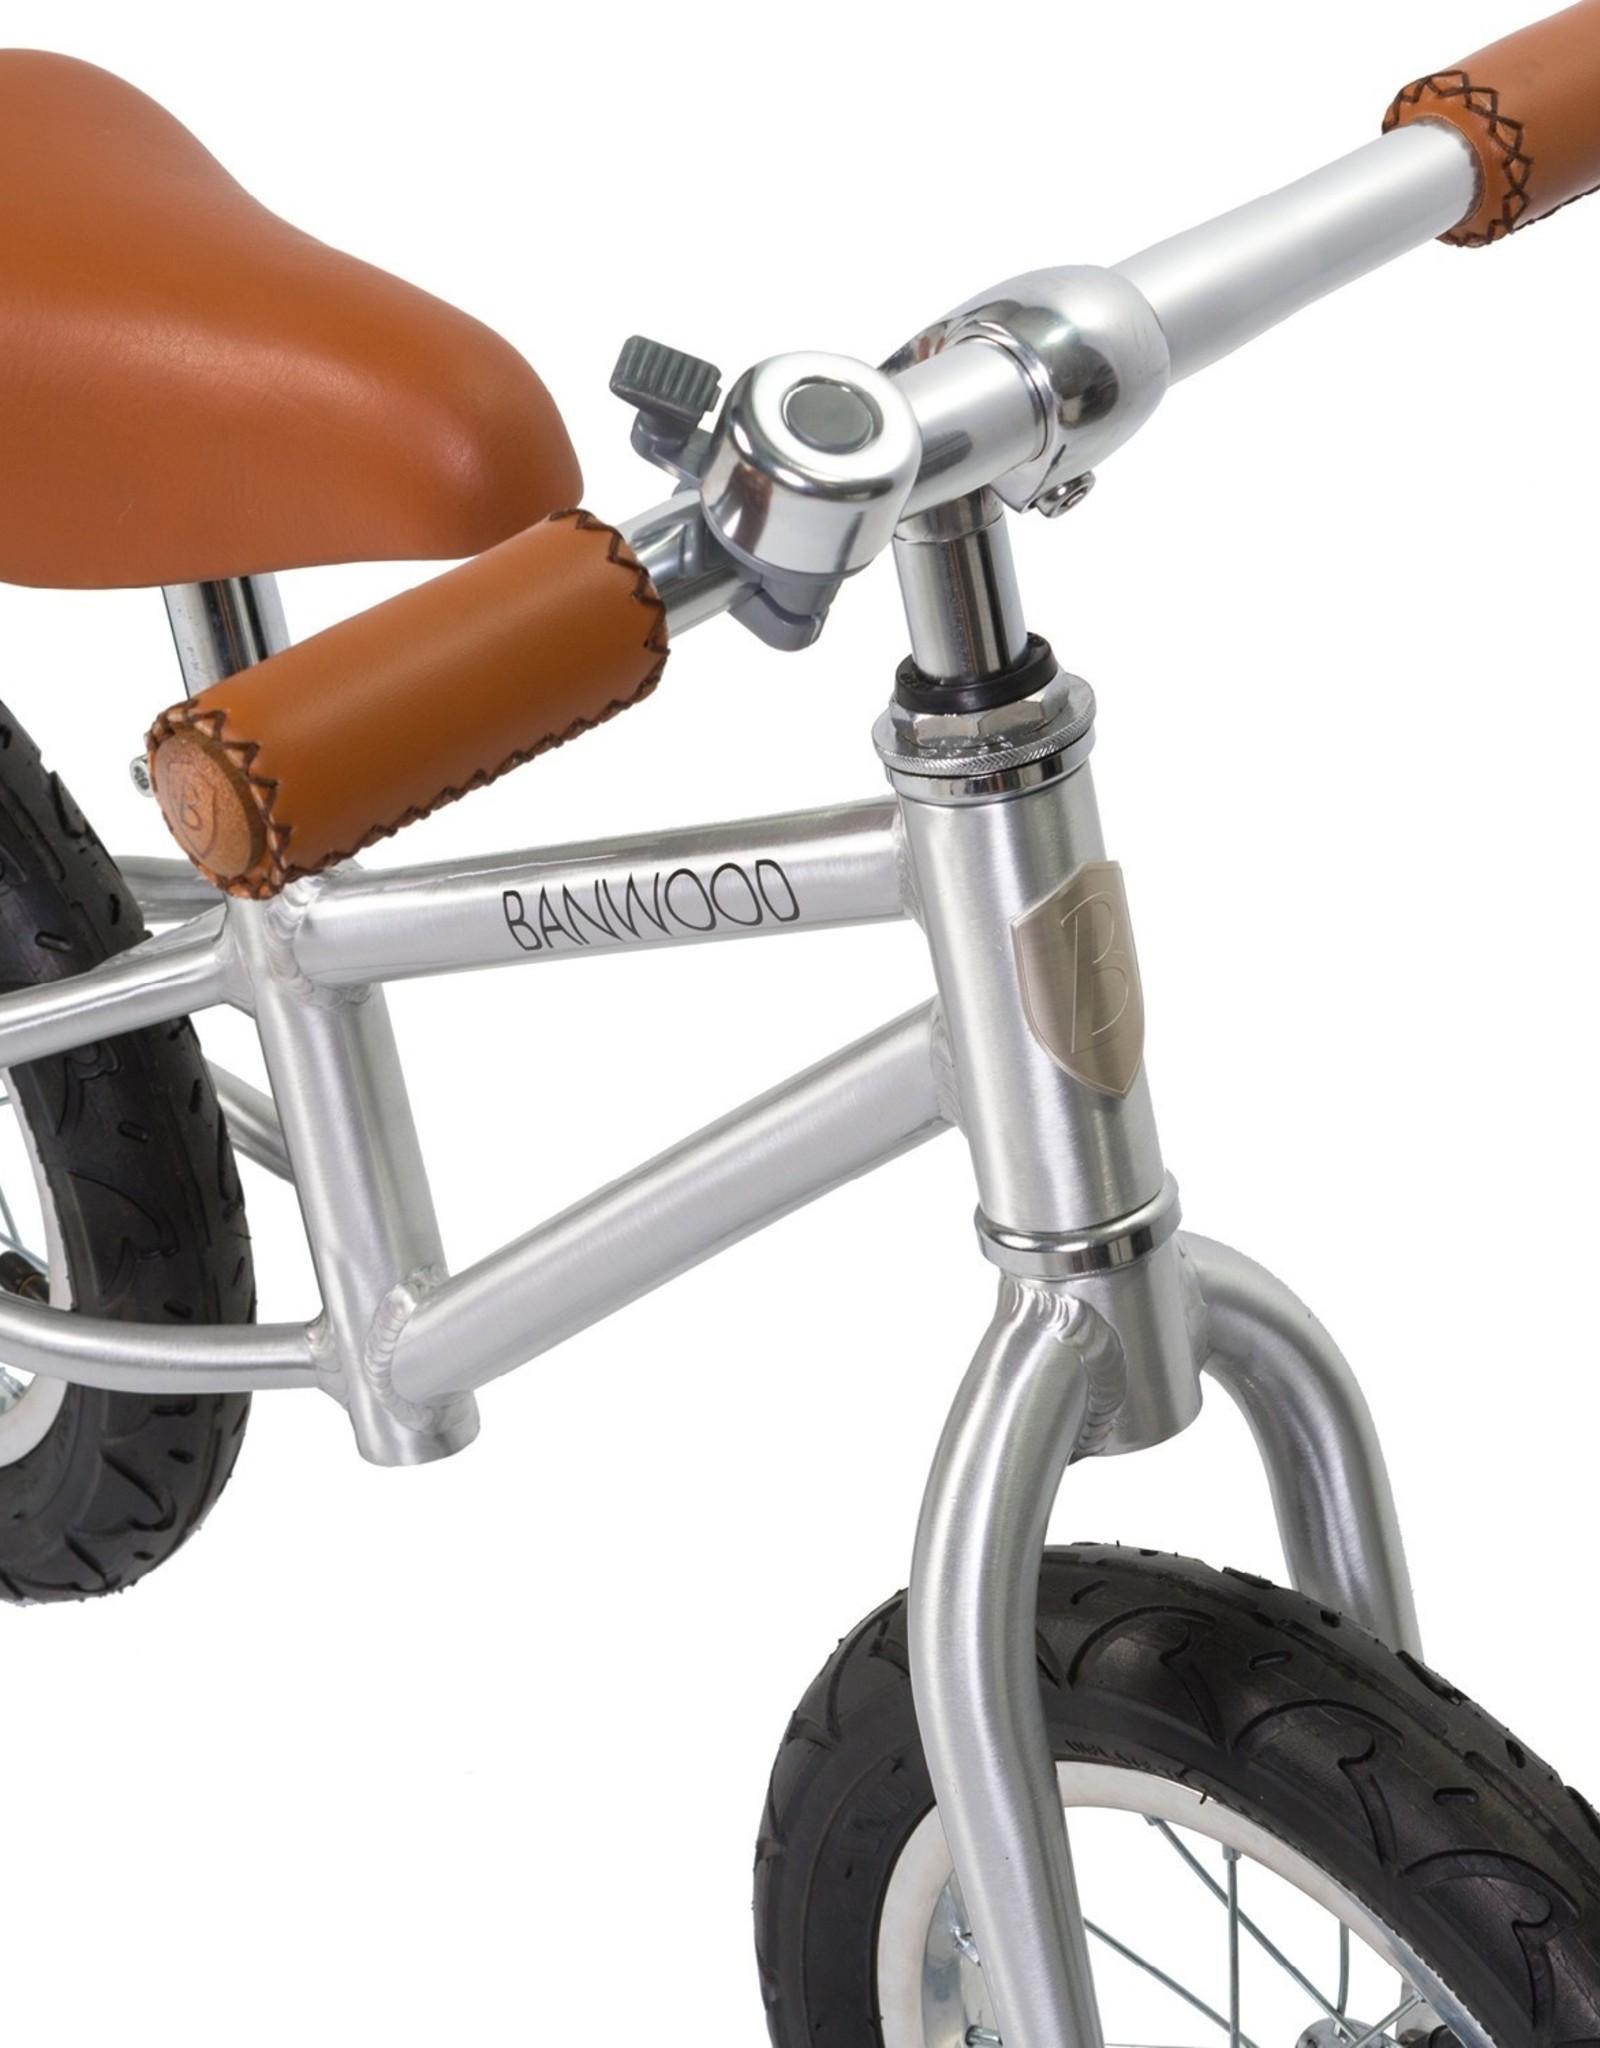 Banwood Vélo d'équilibre First Go  - Édition Chrome